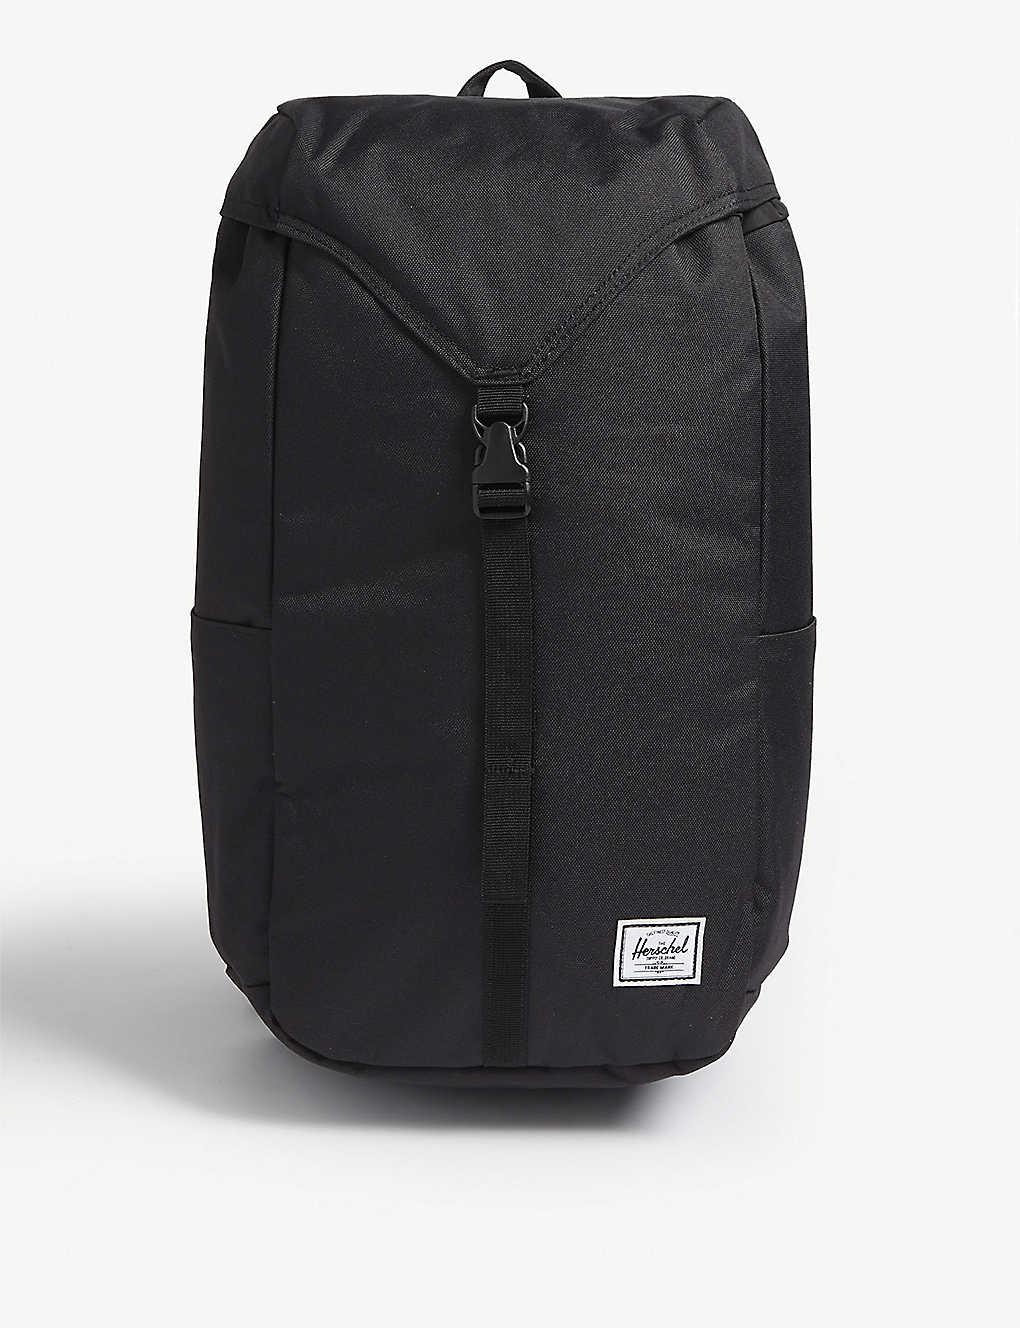 a24b8c99f4 HERSCHEL SUPPLY CO - Thompson backpack